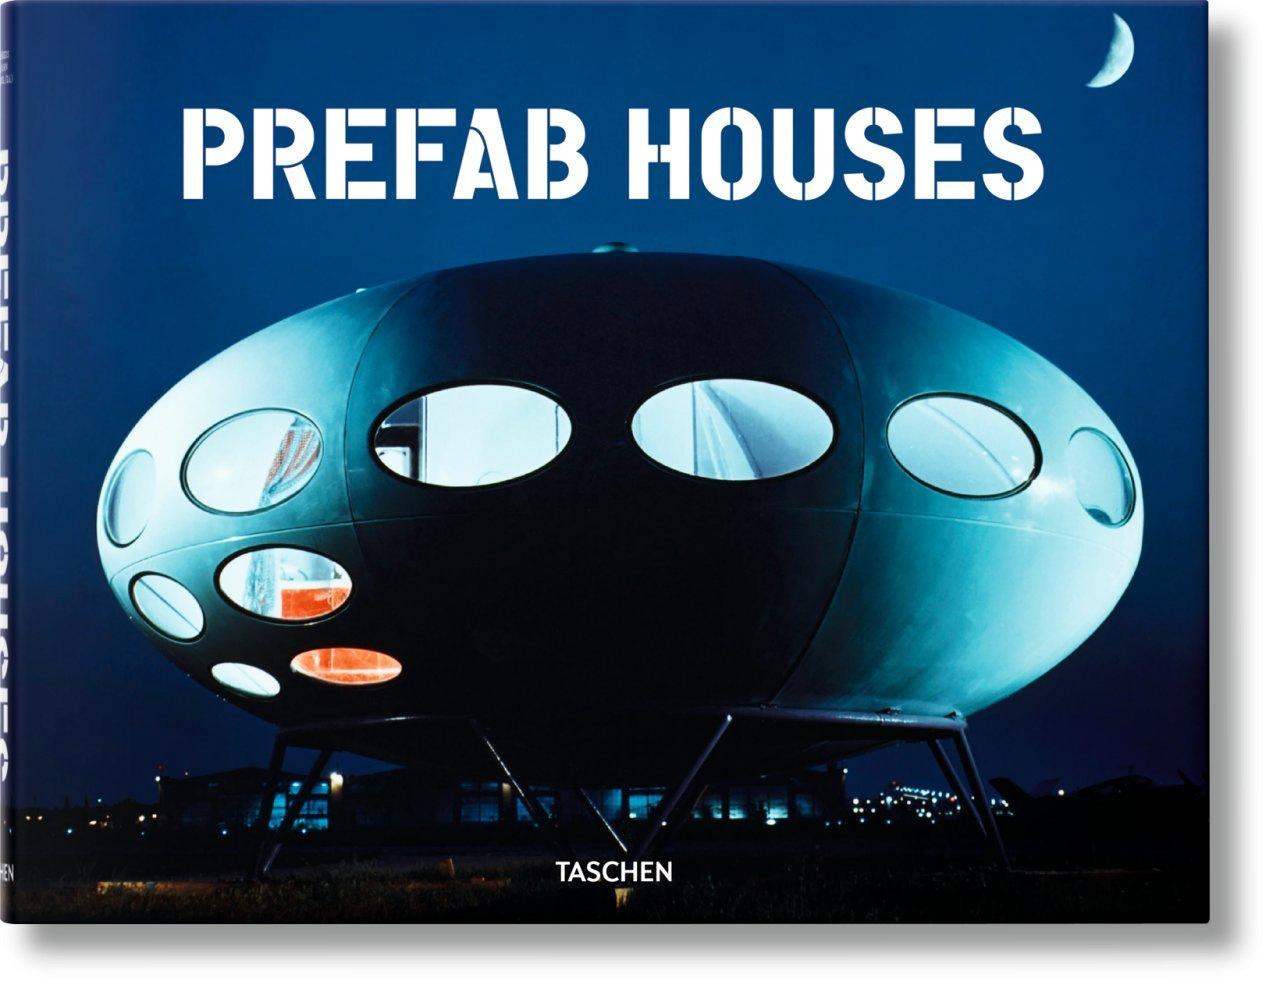 VA-25 PREFAB HOUSES